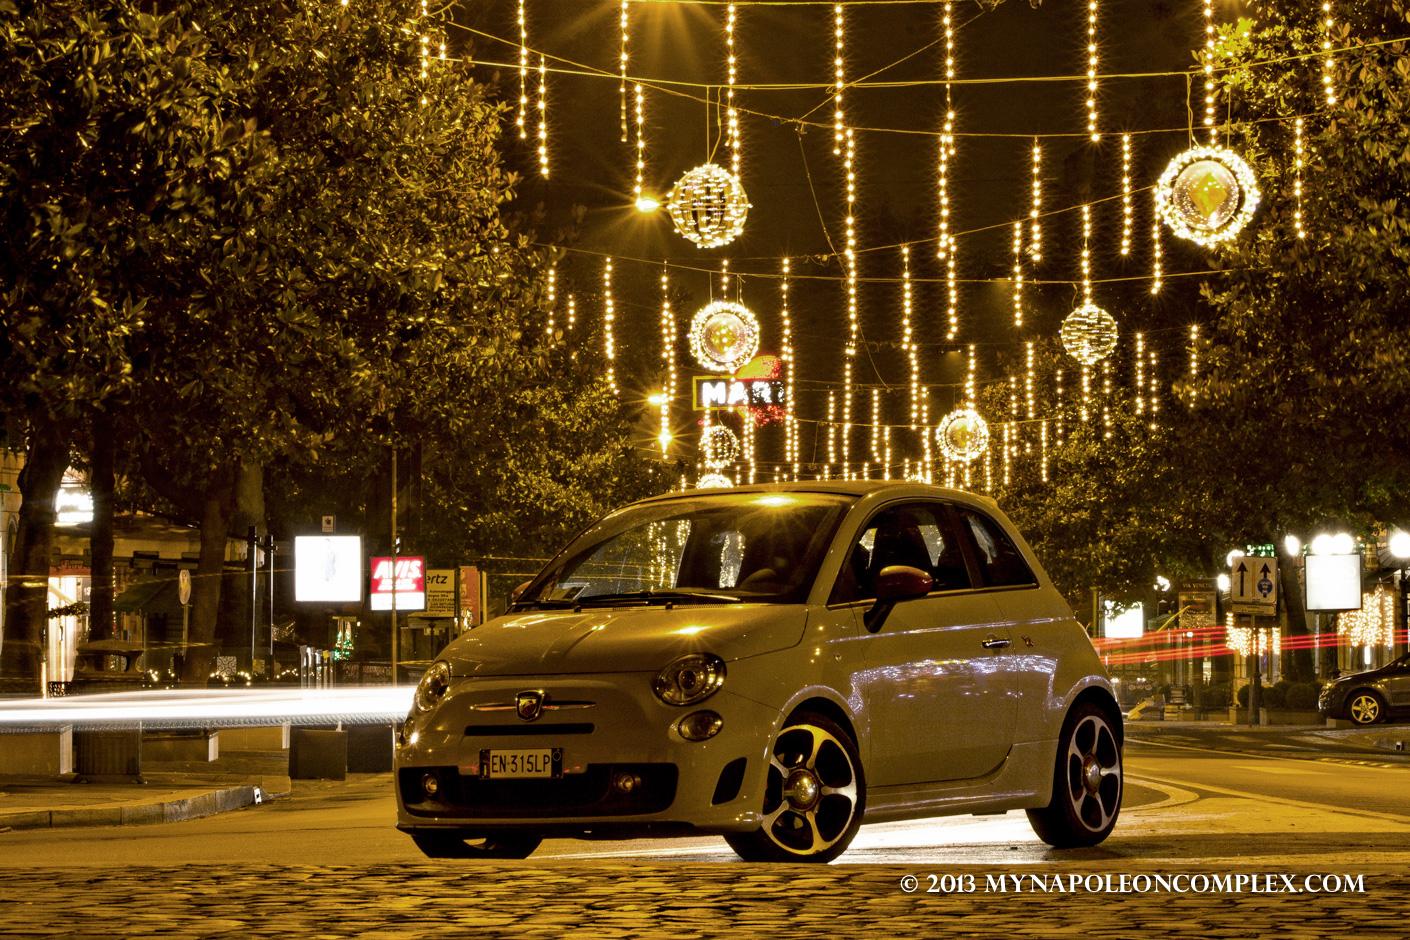 Rome's Christmas Season 2013